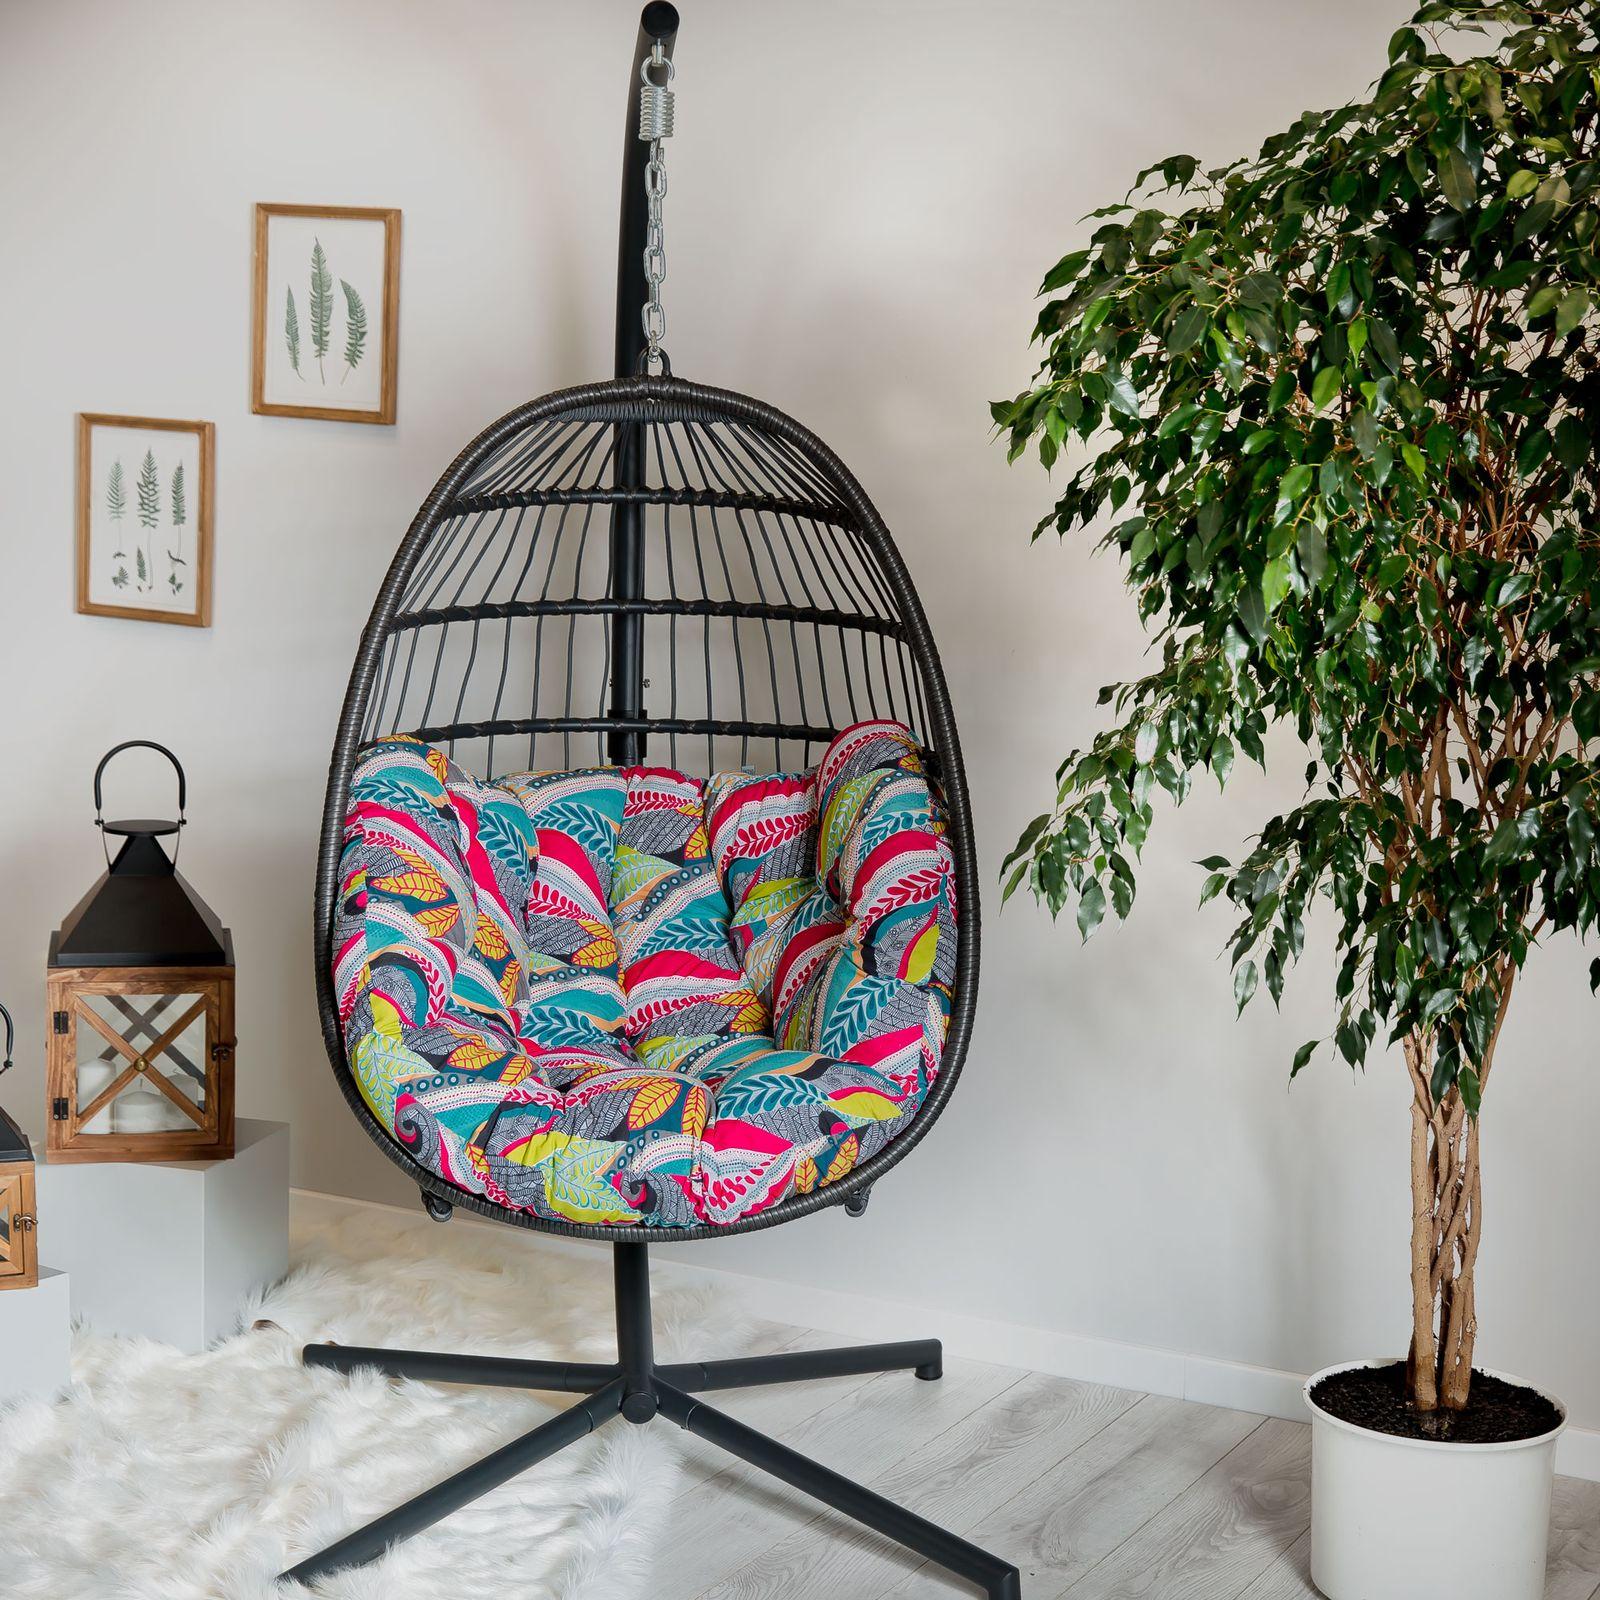 Cojín ovalado para silla colgante G039-11HB 144 x 100/45 x 10/12 cm PATIO